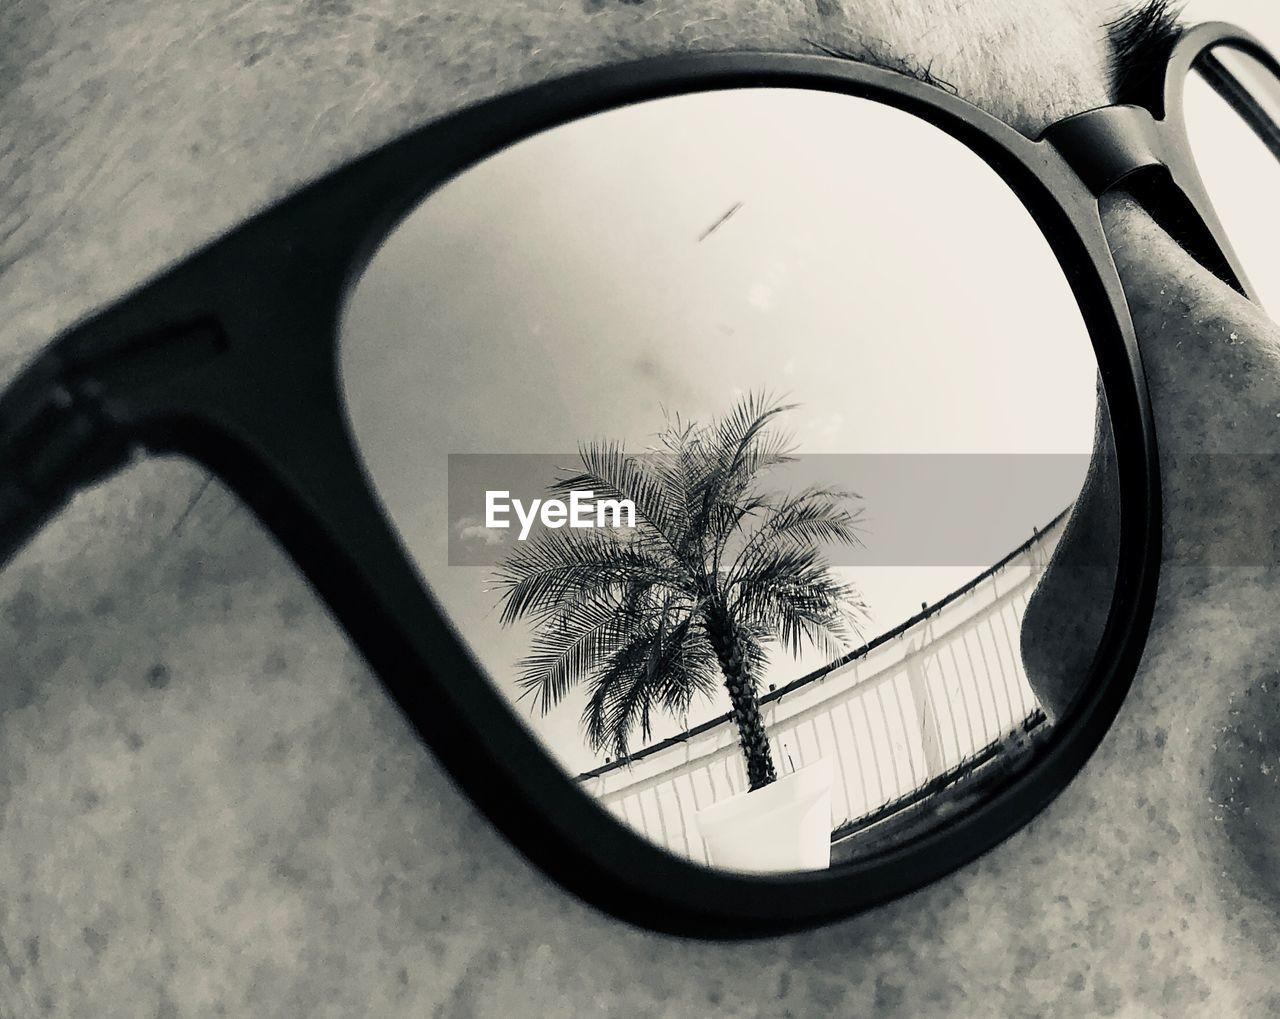 Reflection Of Sunglasses